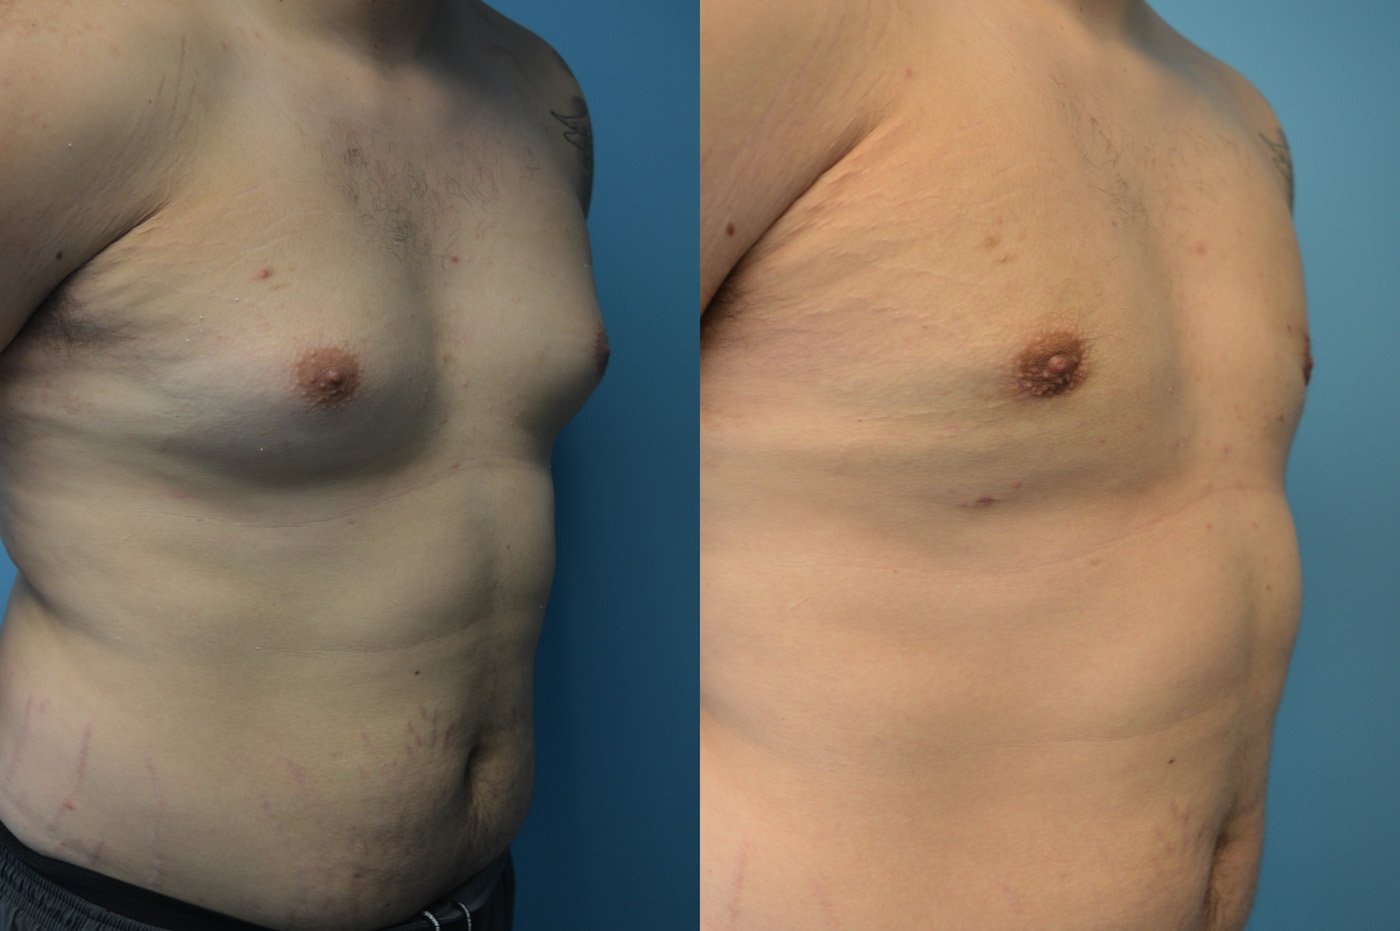 Gynecomastia 2 months after surgery excision liposuction oblique